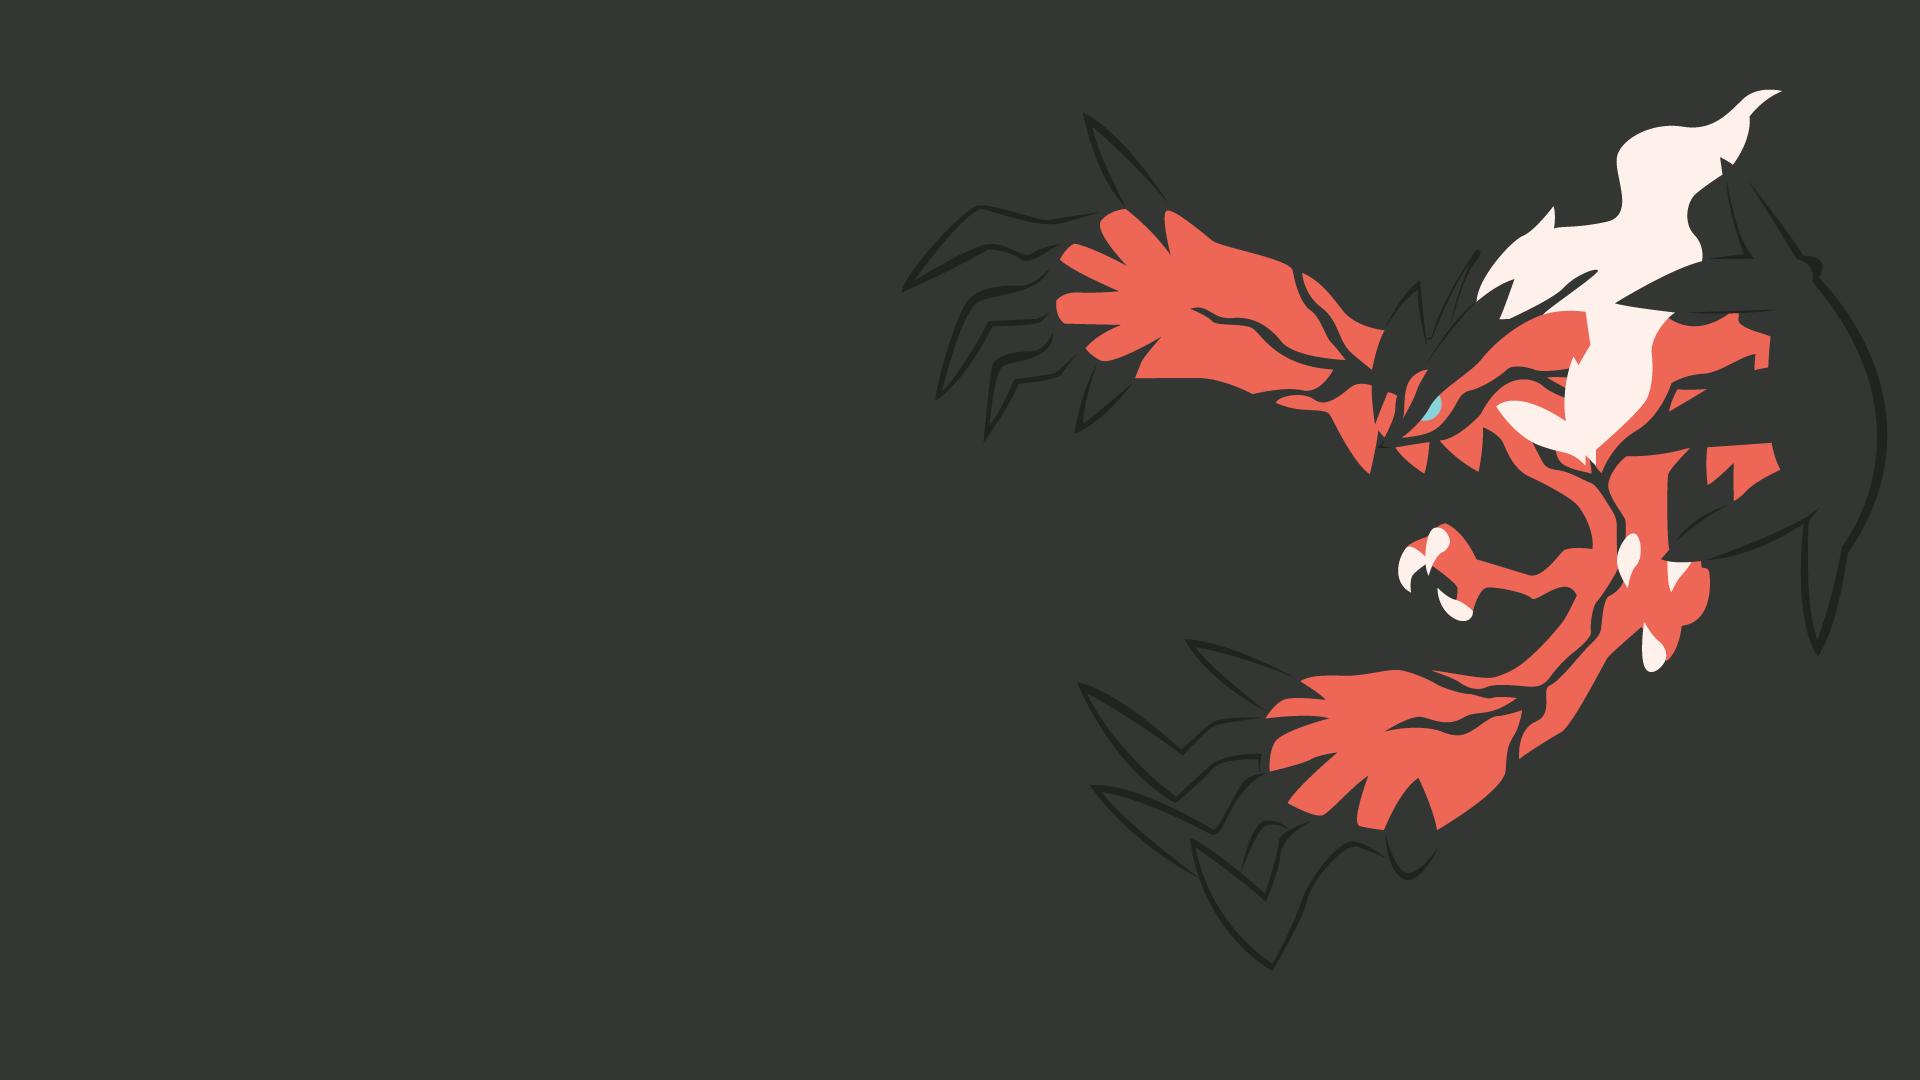 Pokemon X and Y Wallpapers - WallpaperSafari